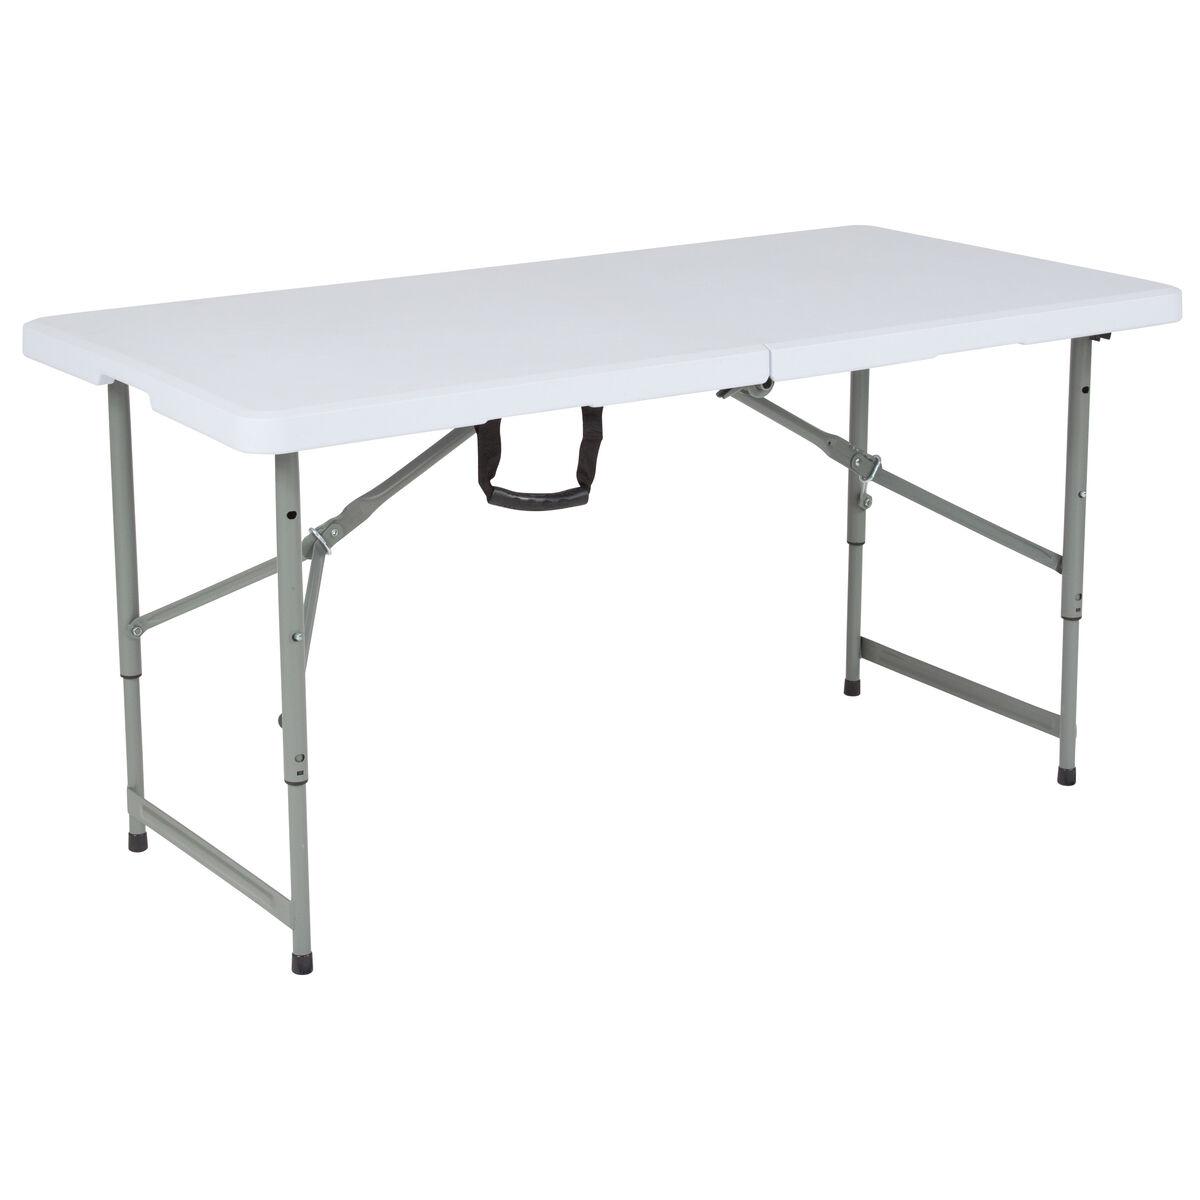 24x48 white bi fold table rb 2448adj gg restaurantfurniture4less com